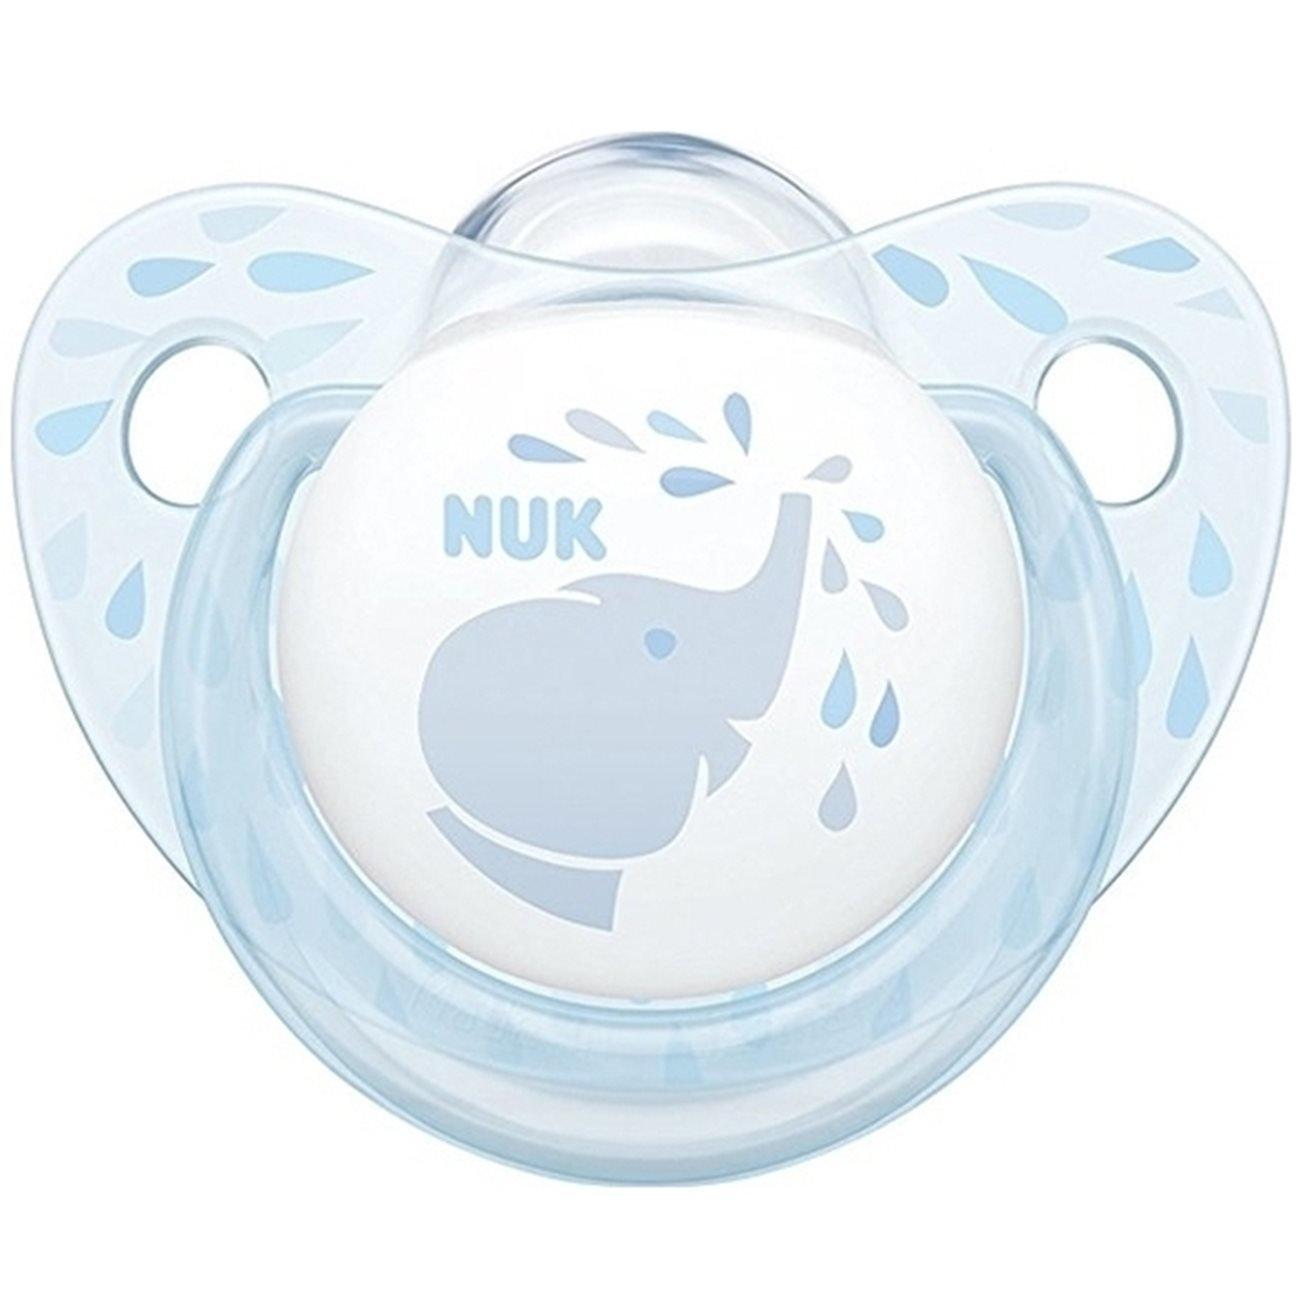 Nuk Baby Rose & Blue Πιπίλα Σιλικόνης με Κρίκο 1τεμάχιο – Baby Blue2 0-6 Μηνών